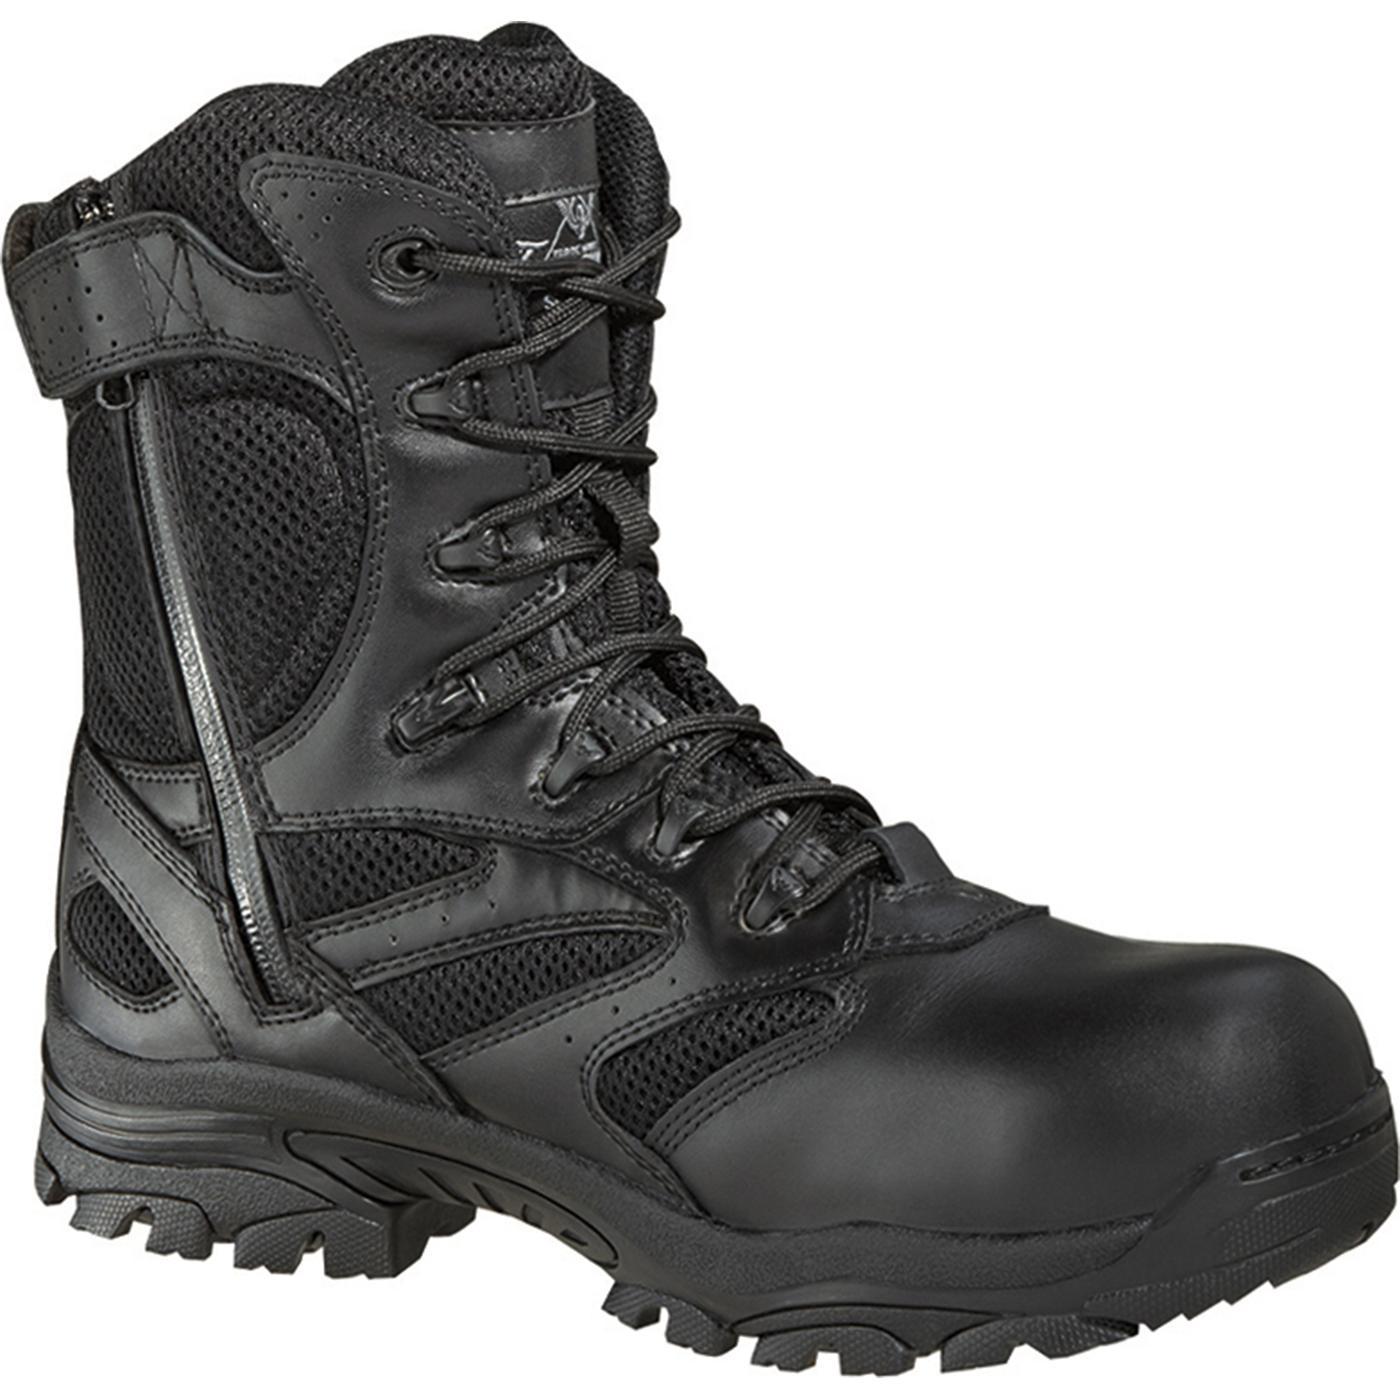 Black Composite Toe Side Zipper military boot - Thorogood 804-6191